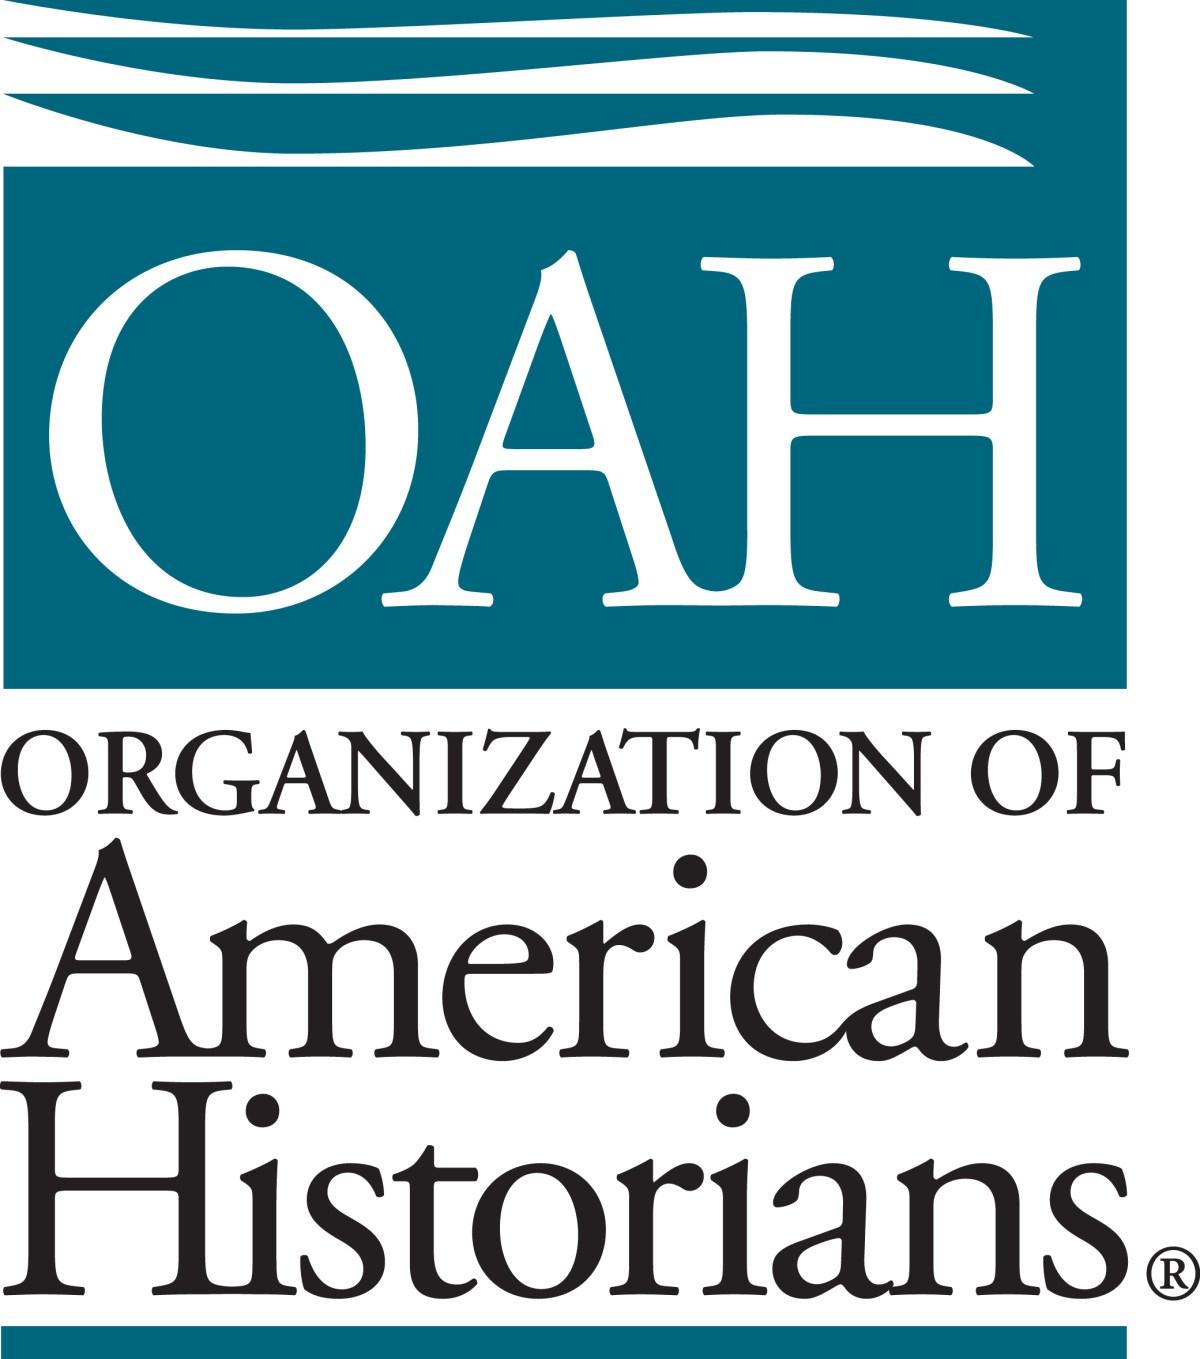 Organization of American Historians (304310)